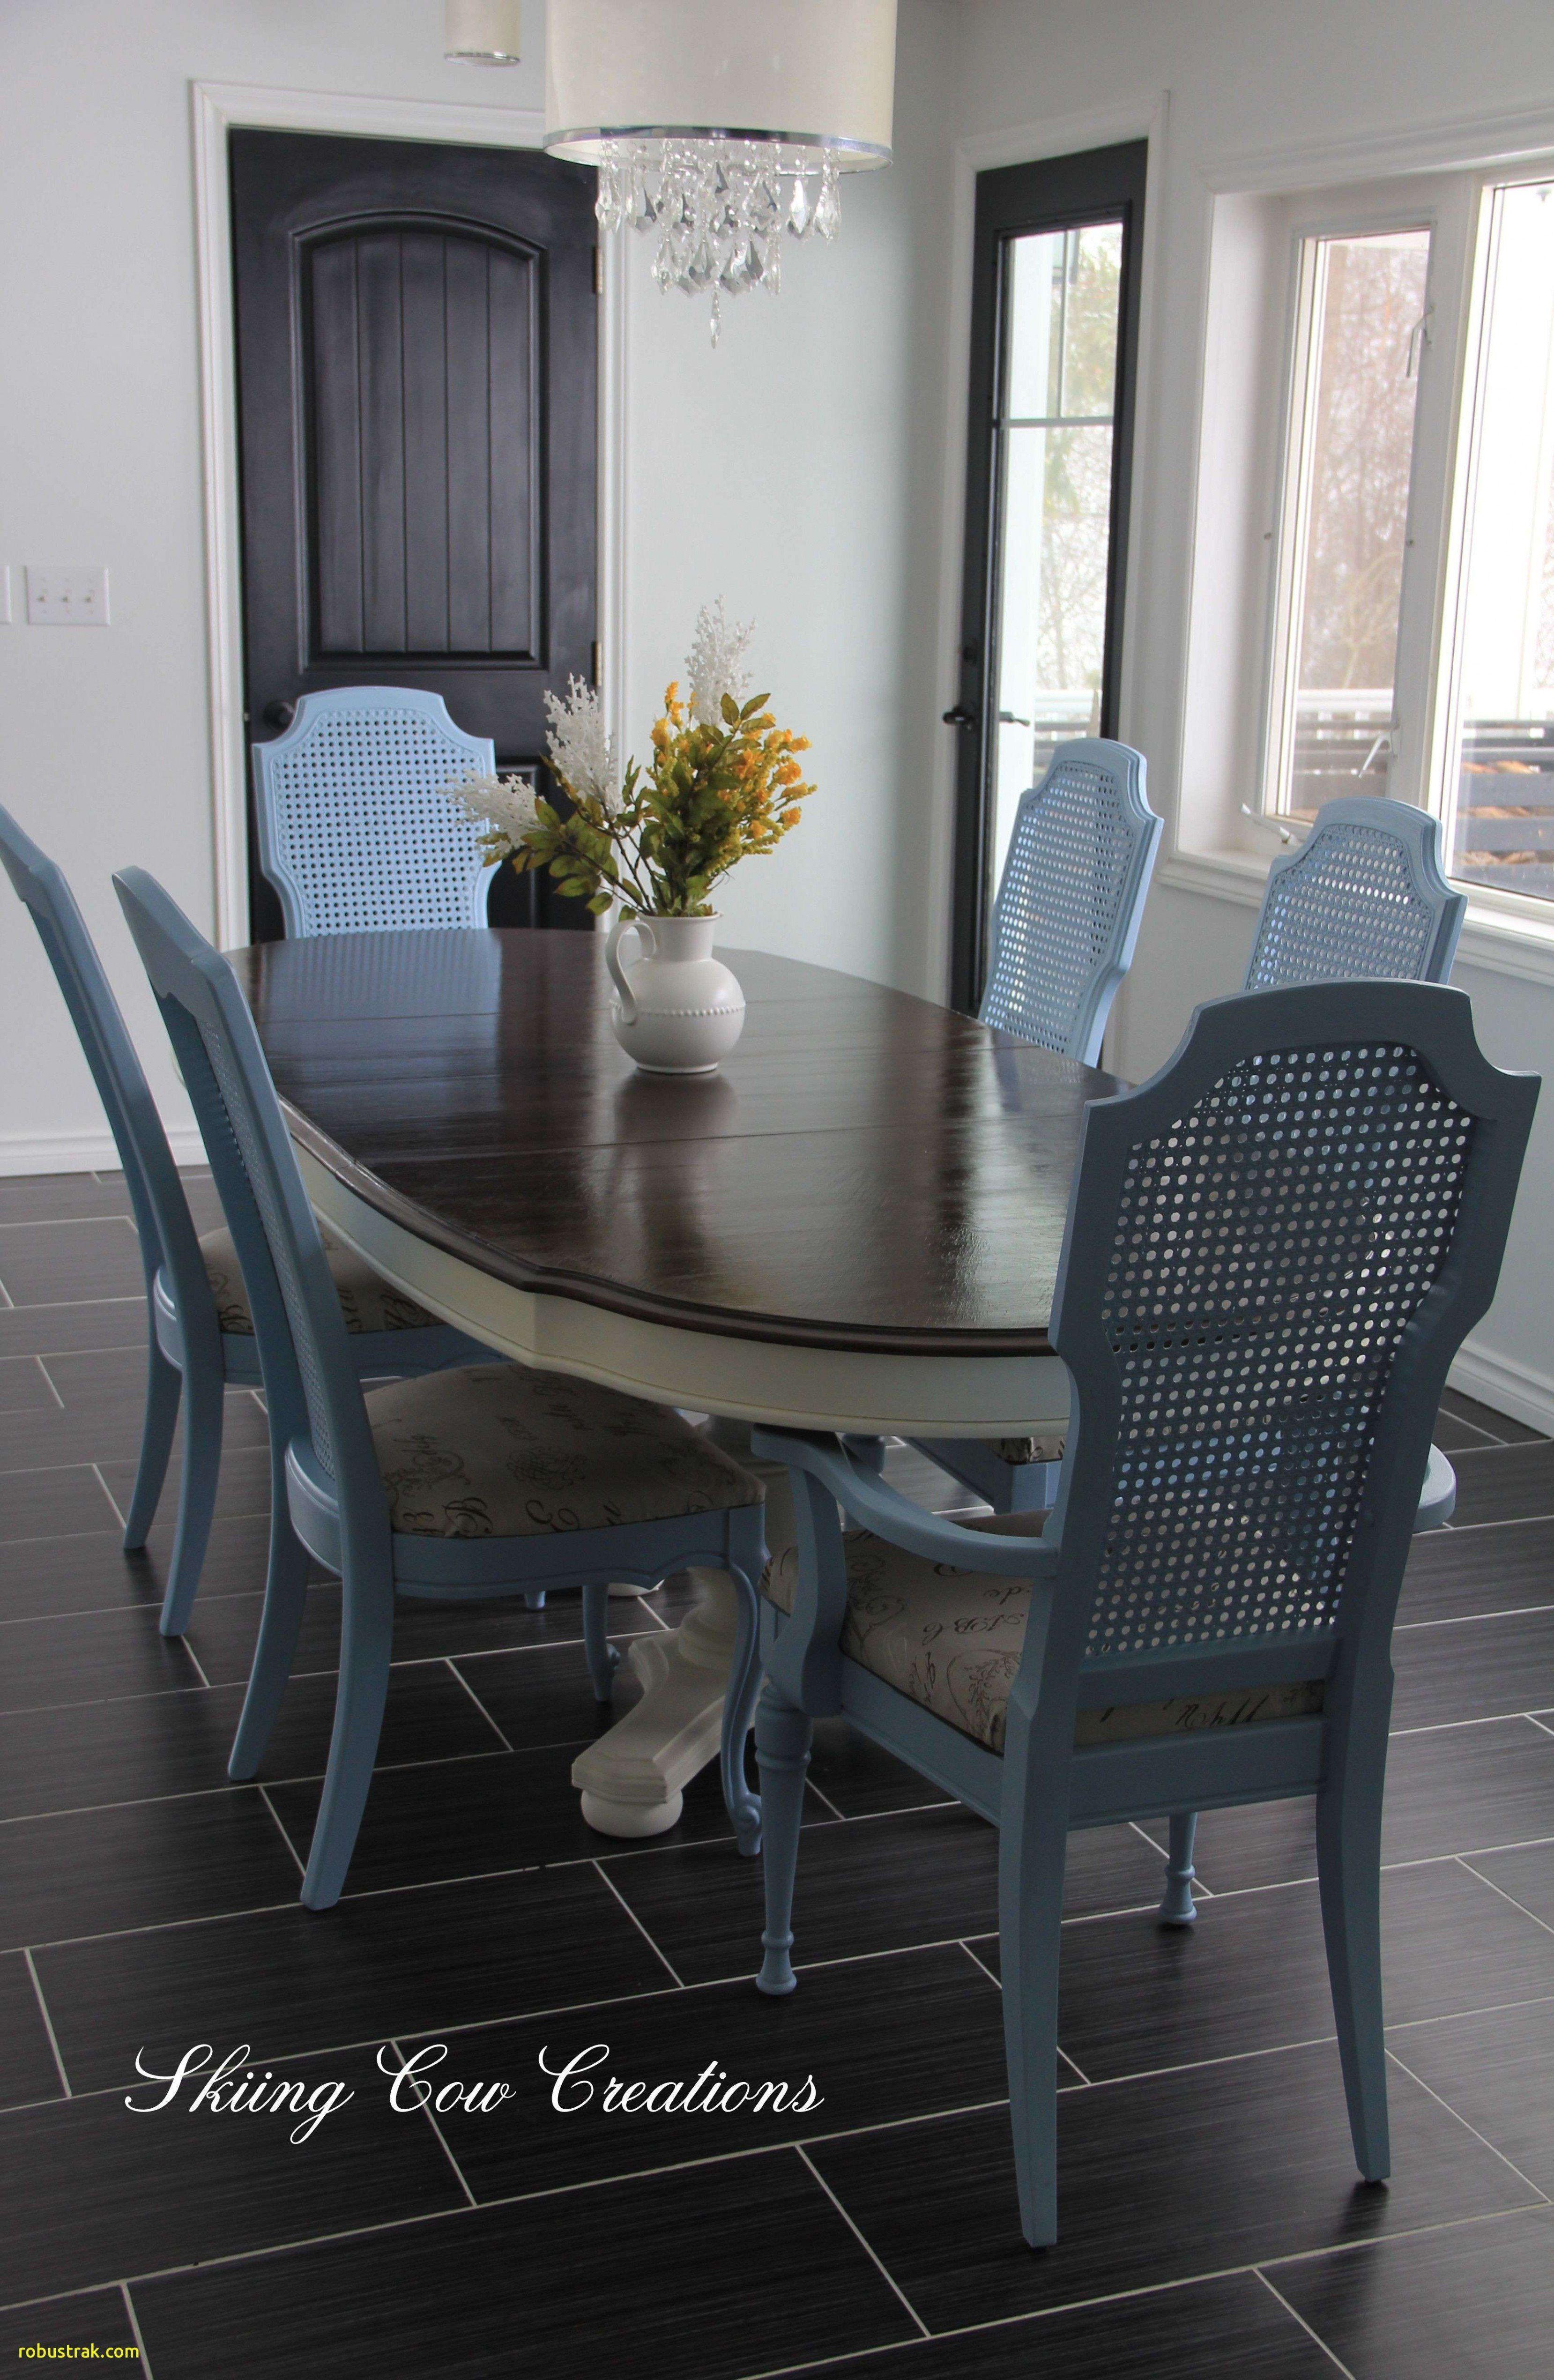 24+ Elegant dining room table centerpieces ideas Trending